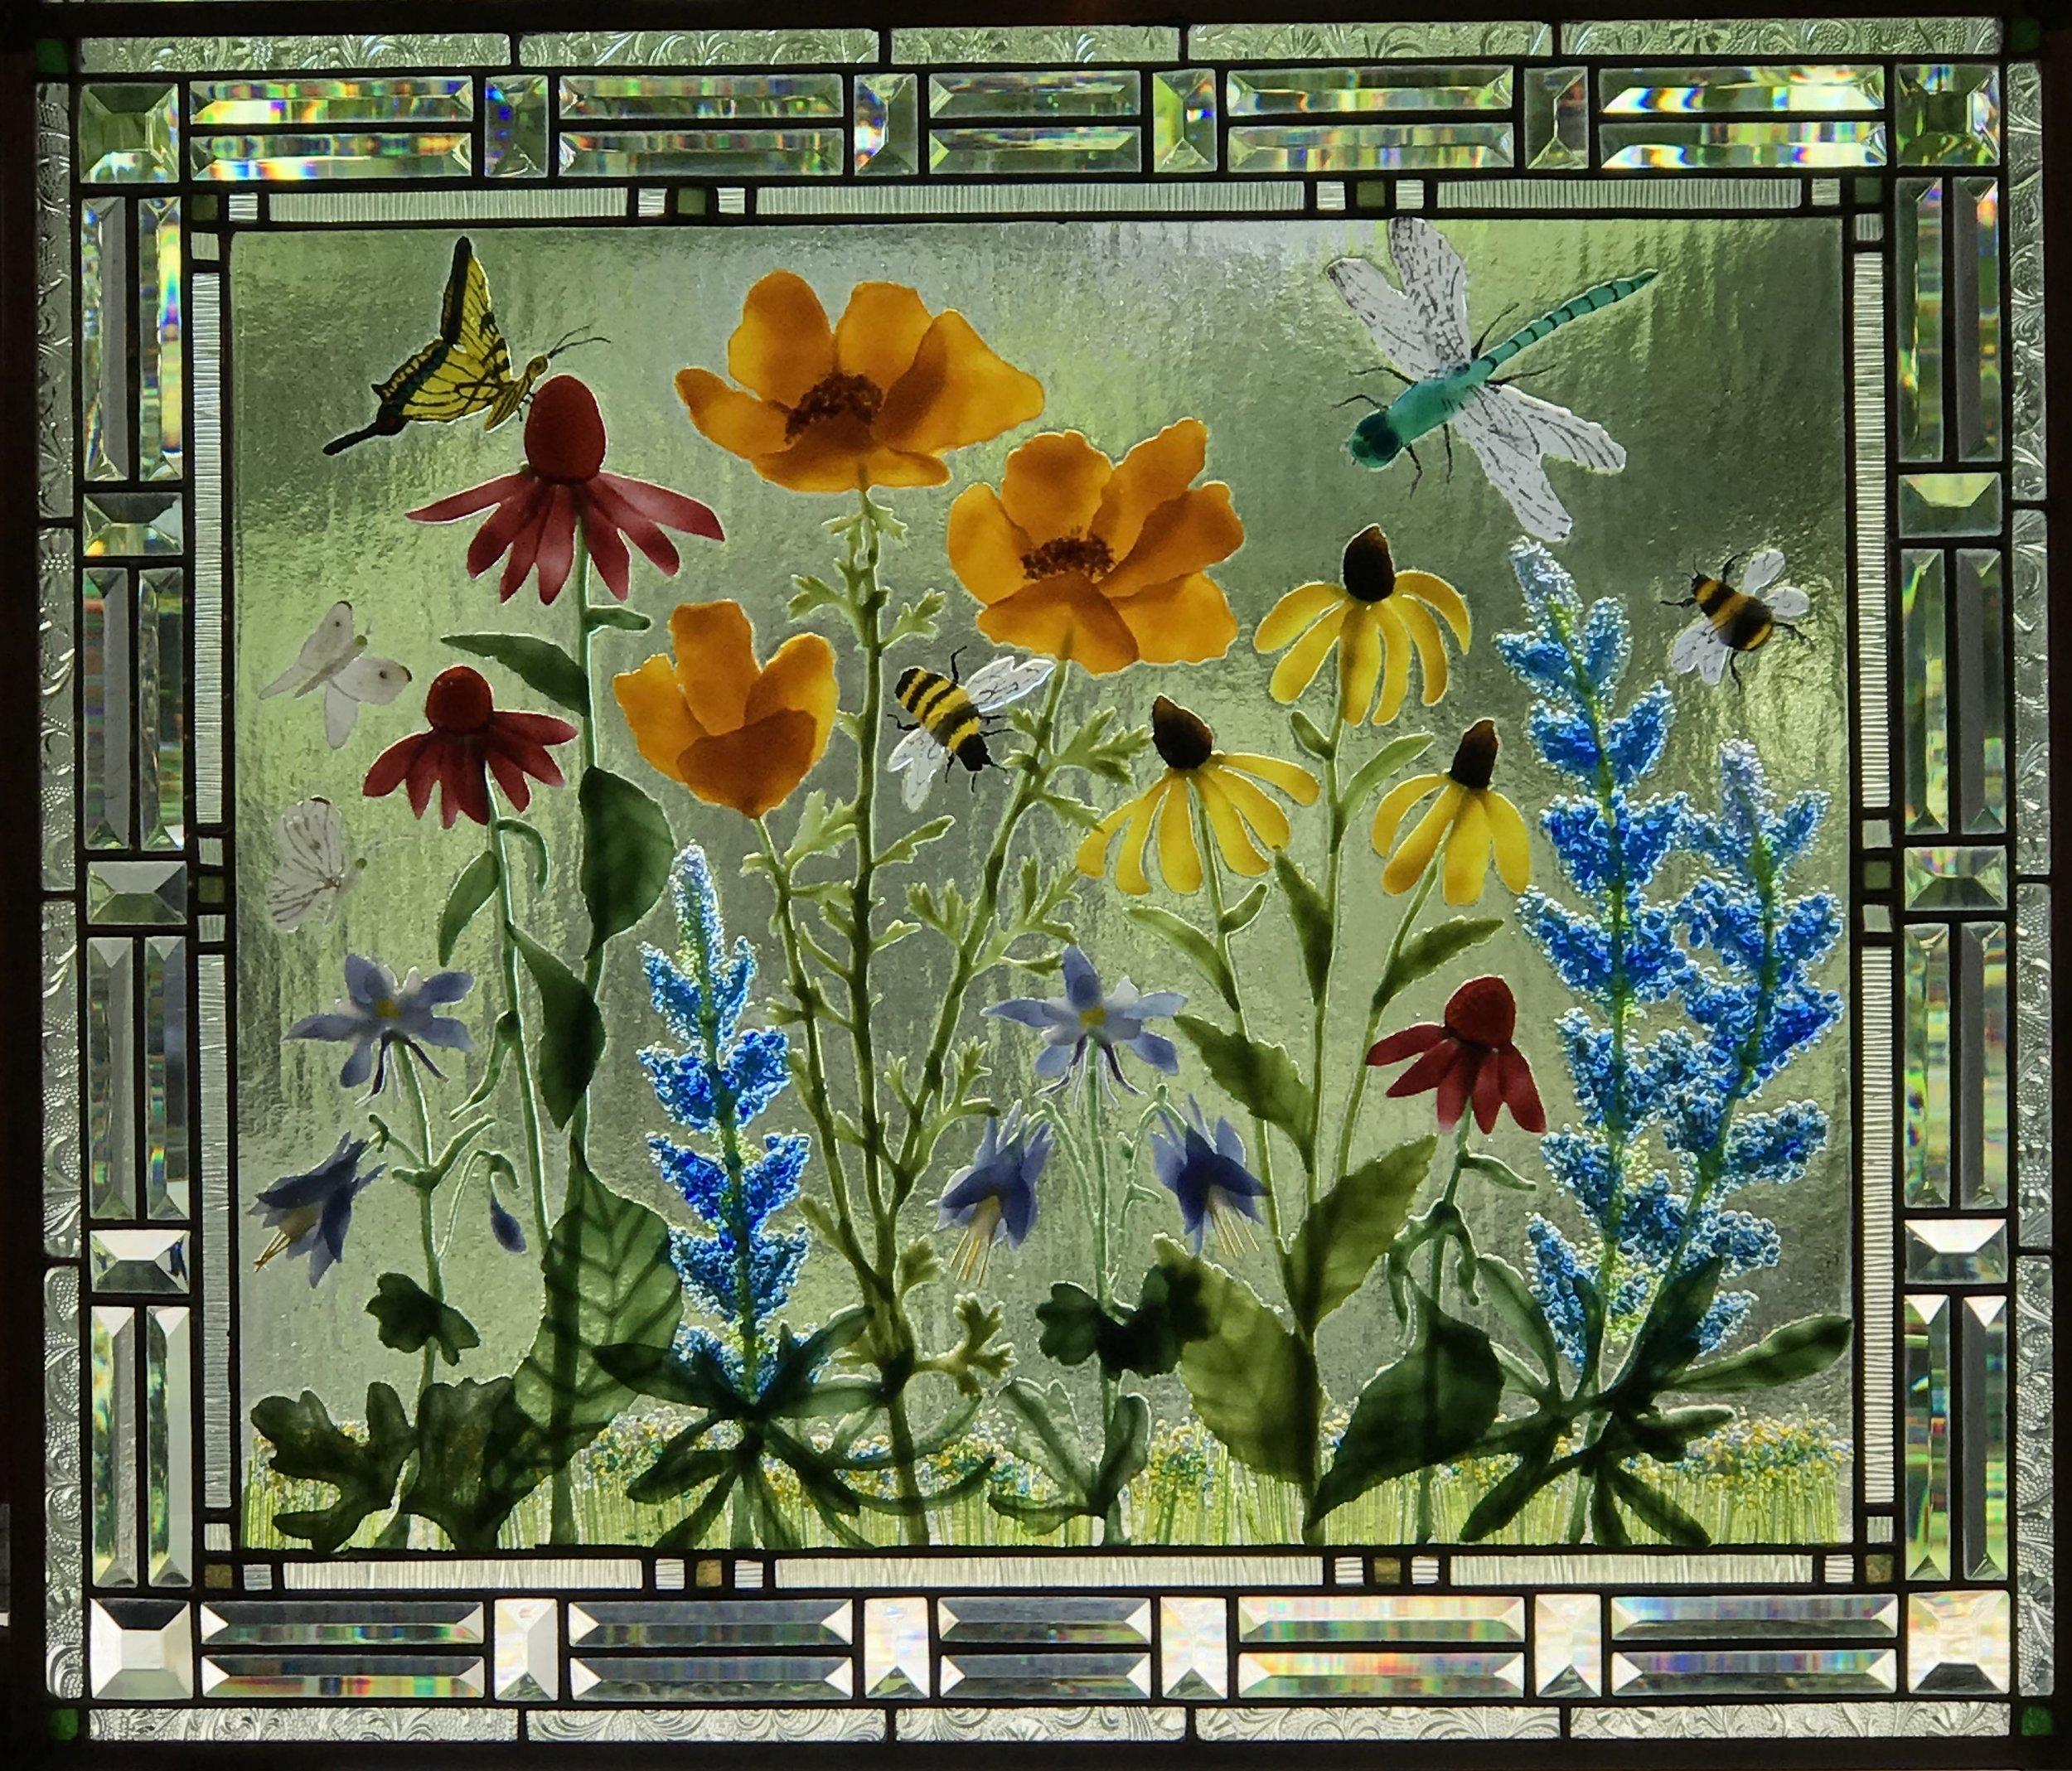 Pollinators flower garden